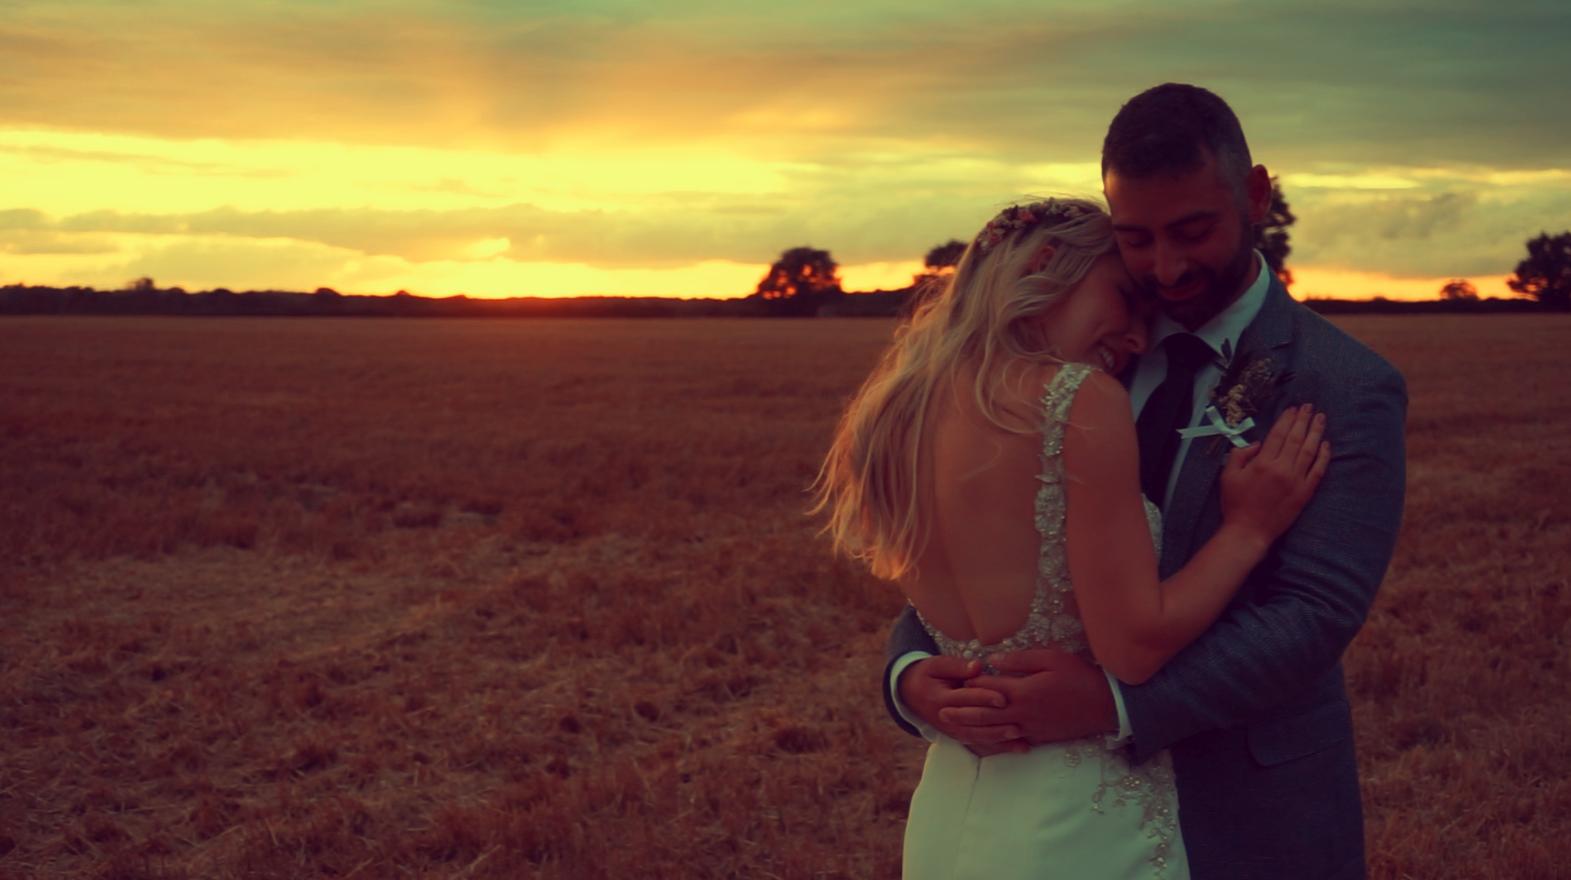 Image: Amber & Chris's wedding film shot in Wroxham & The Octagon Barn in Norfolk